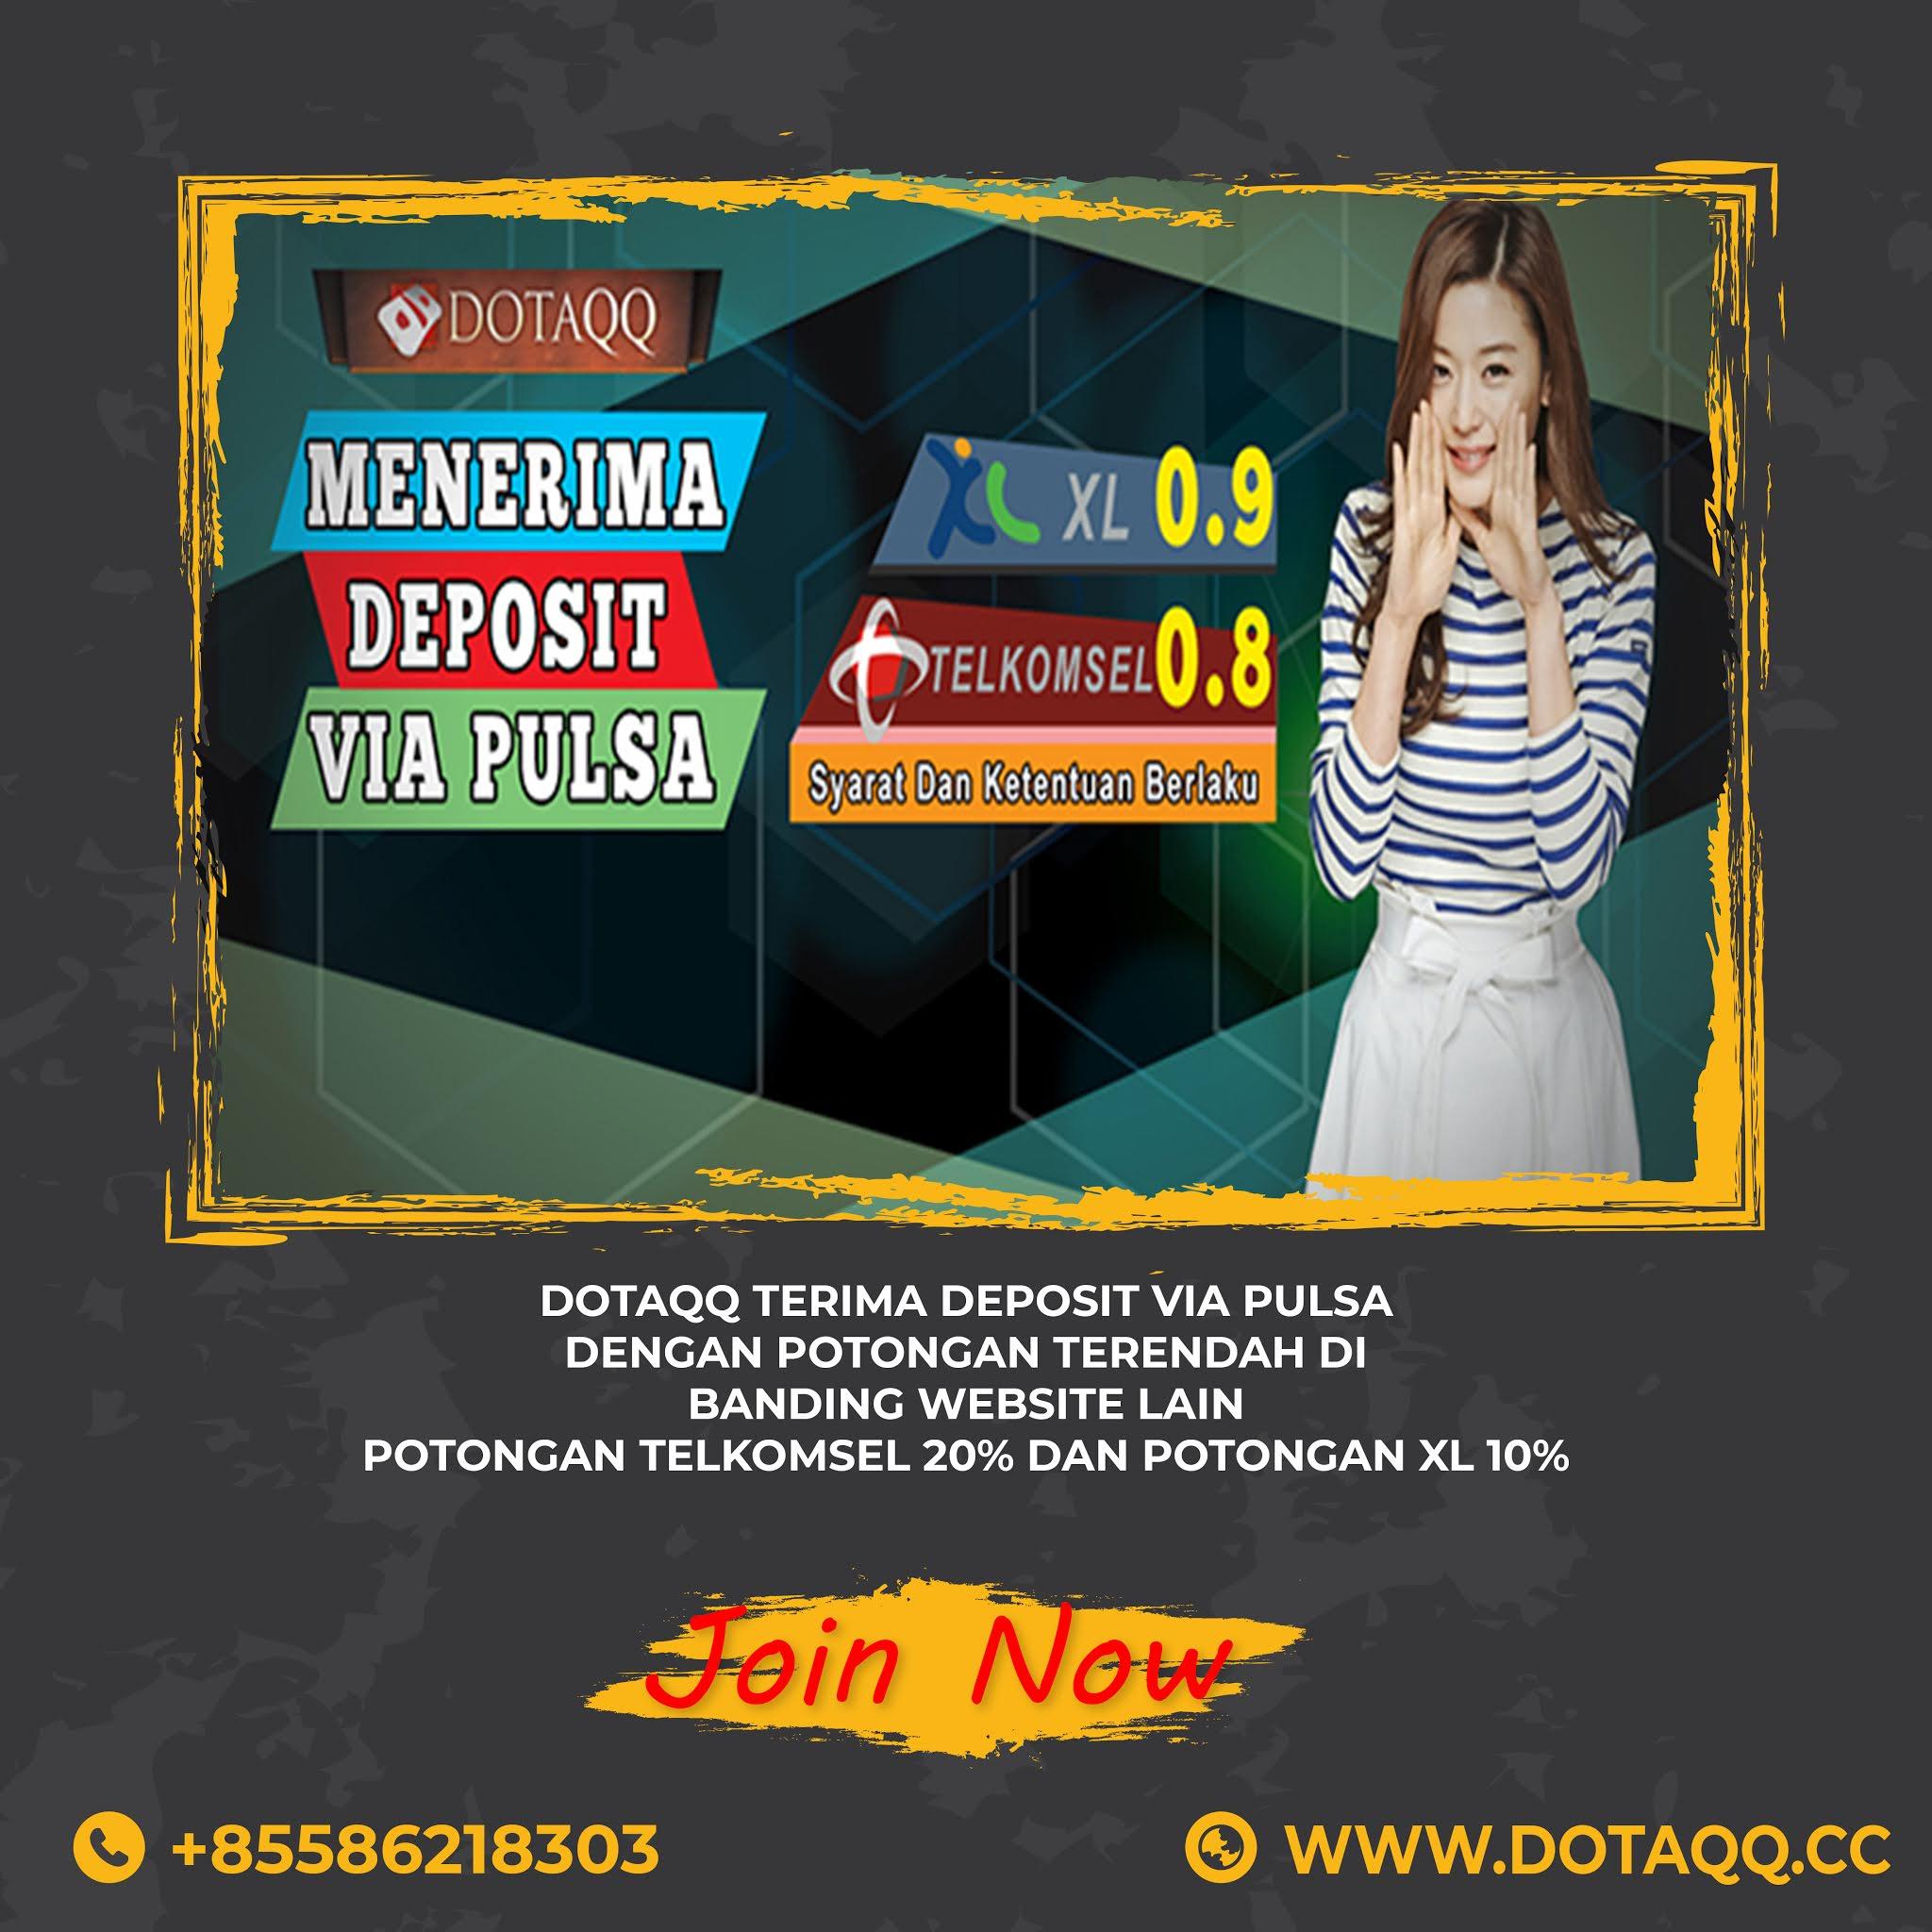 Dotadomino Situs Judi Qq Online Domino99 Pkv Games 2020 Agustus 2020